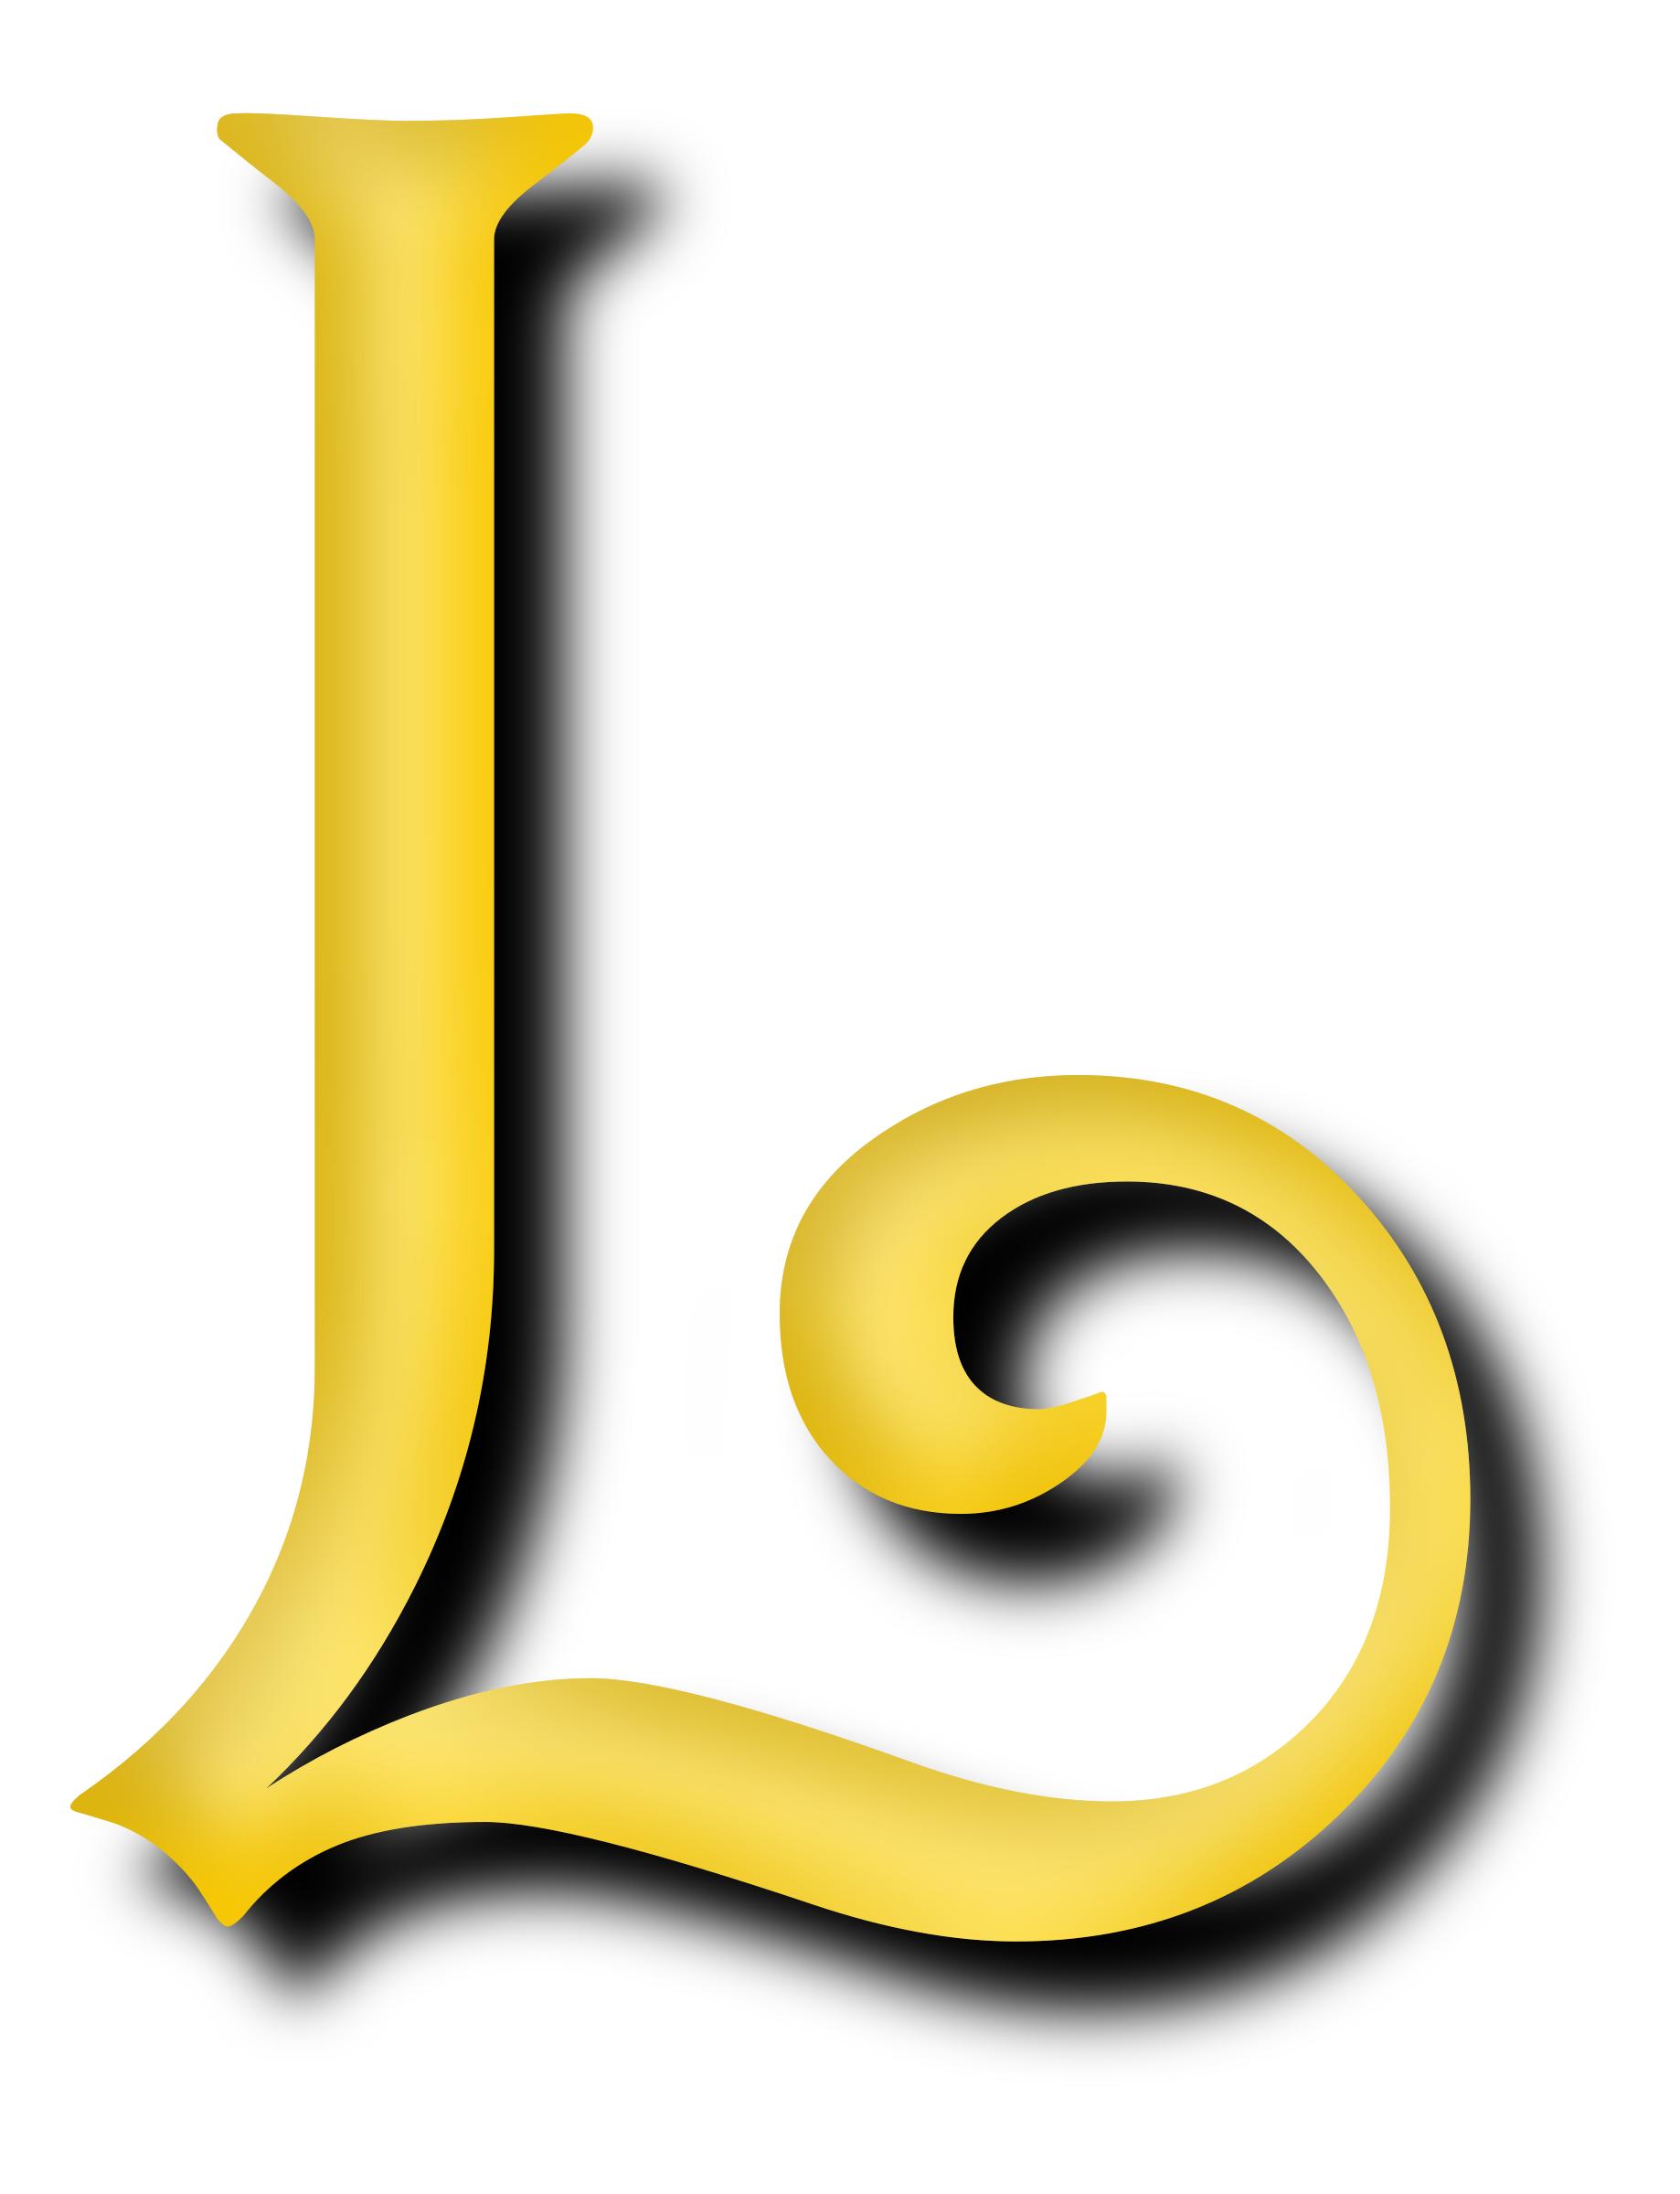 Diamond Letter S Png